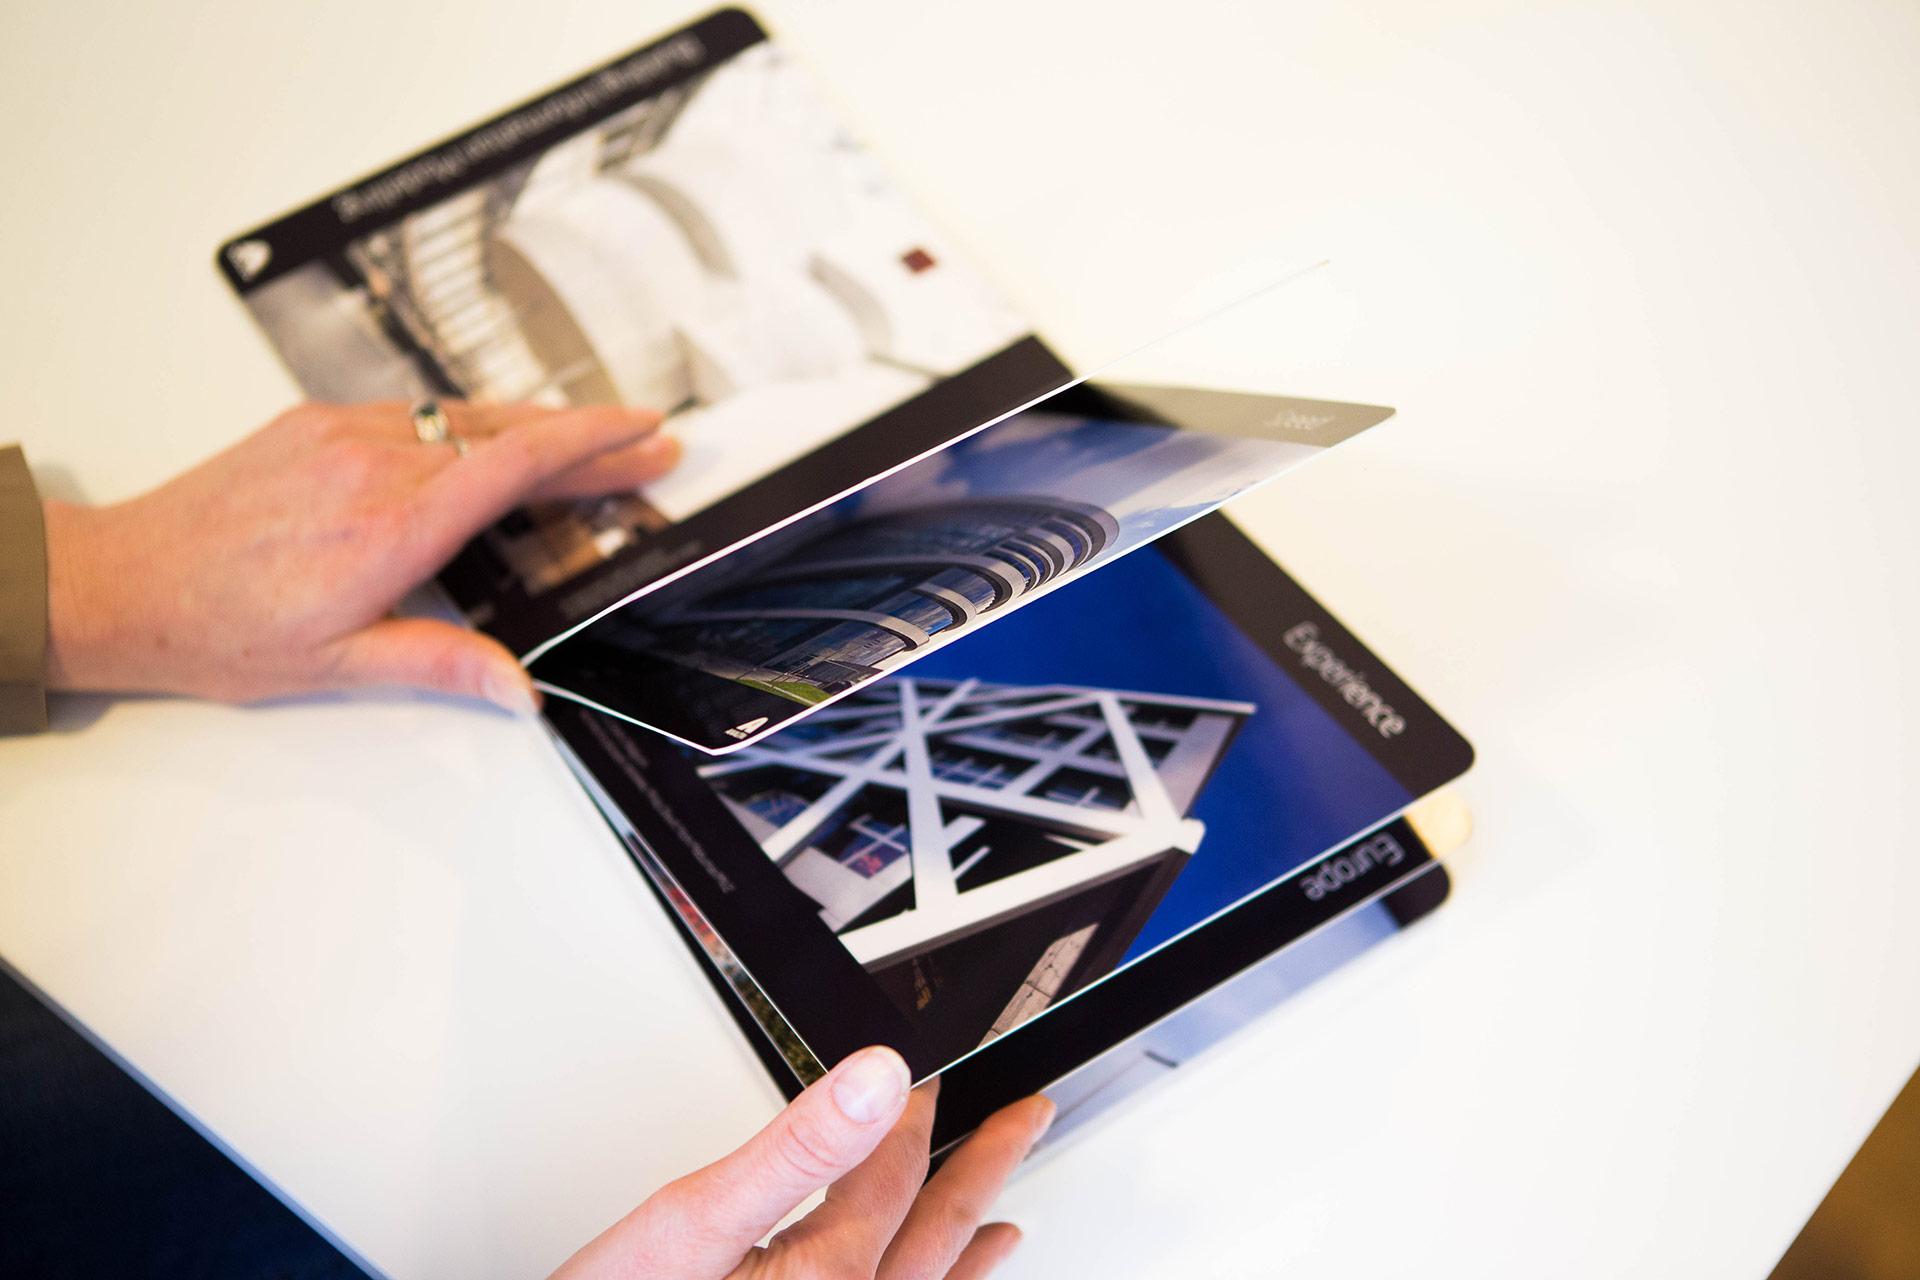 PerfectBook - Boek met extra dikke pagina's van 2 mm